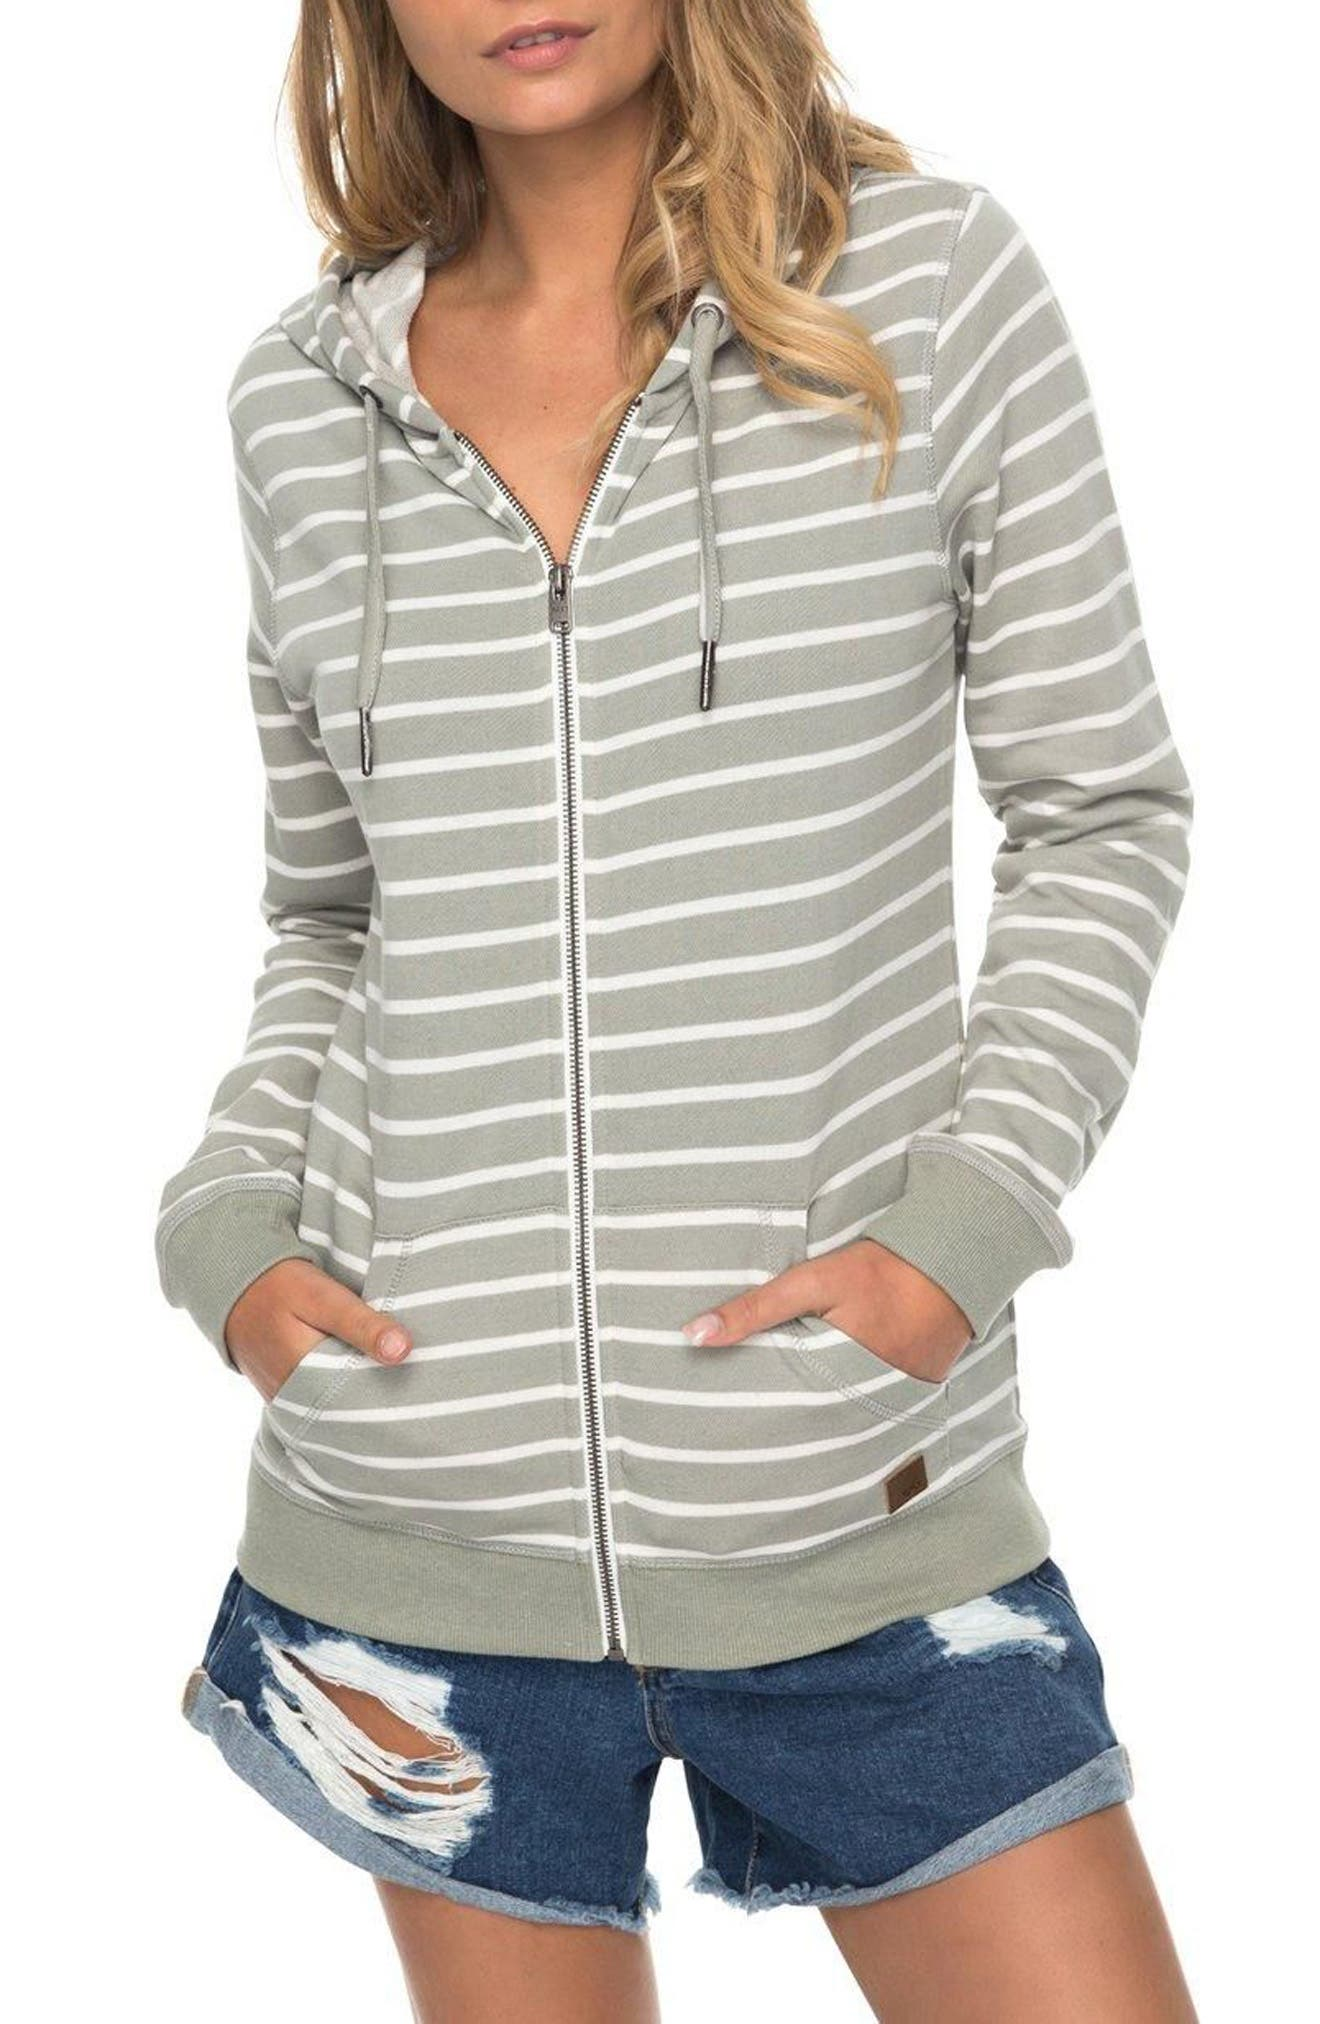 Trippin Stripe Hoodie,                         Main,                         color, Wrought Iron Trippin Stripe